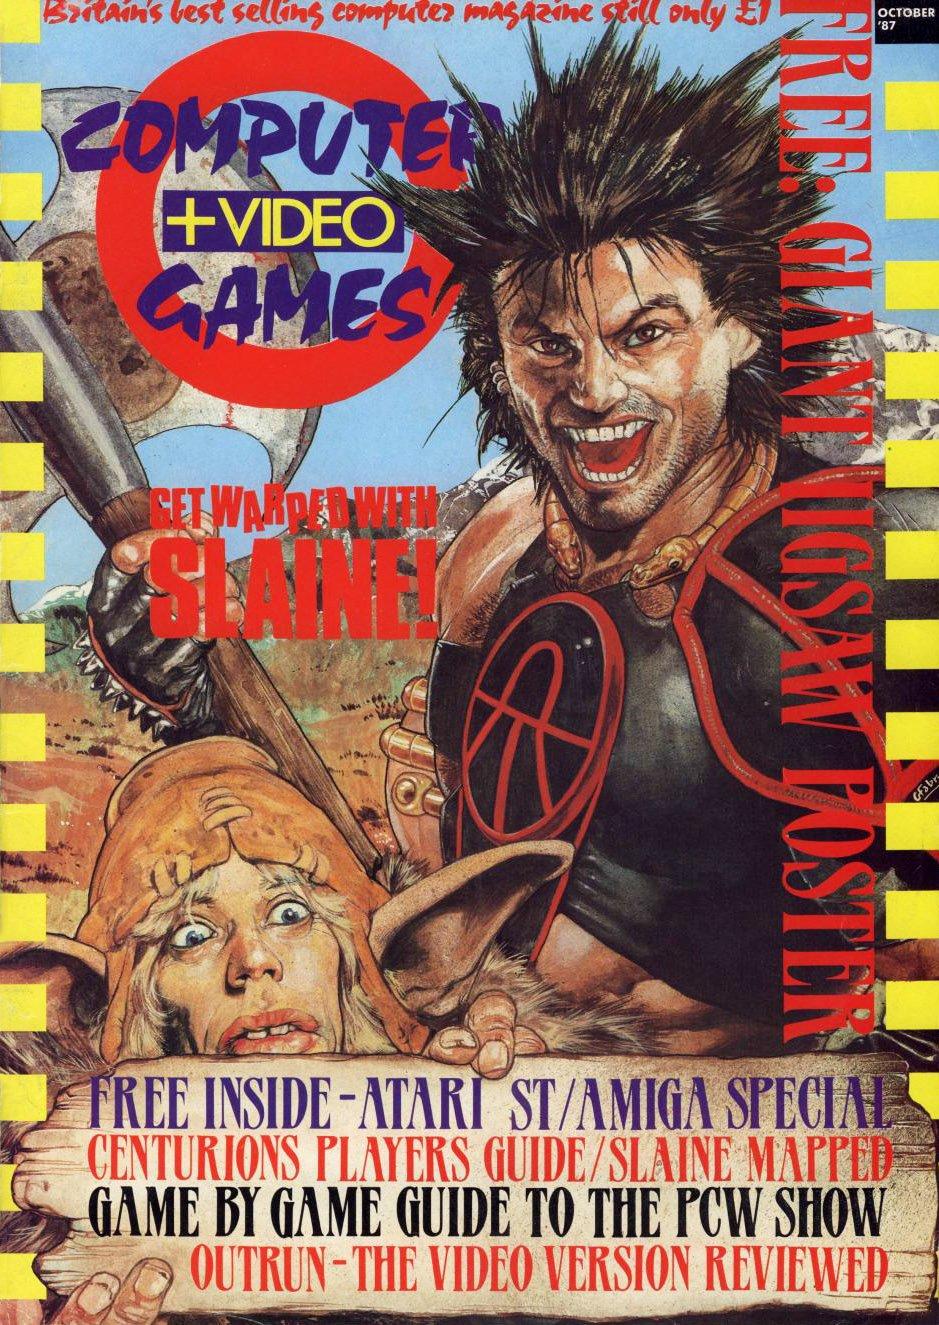 Computer & Video Games 072 (October 1987)